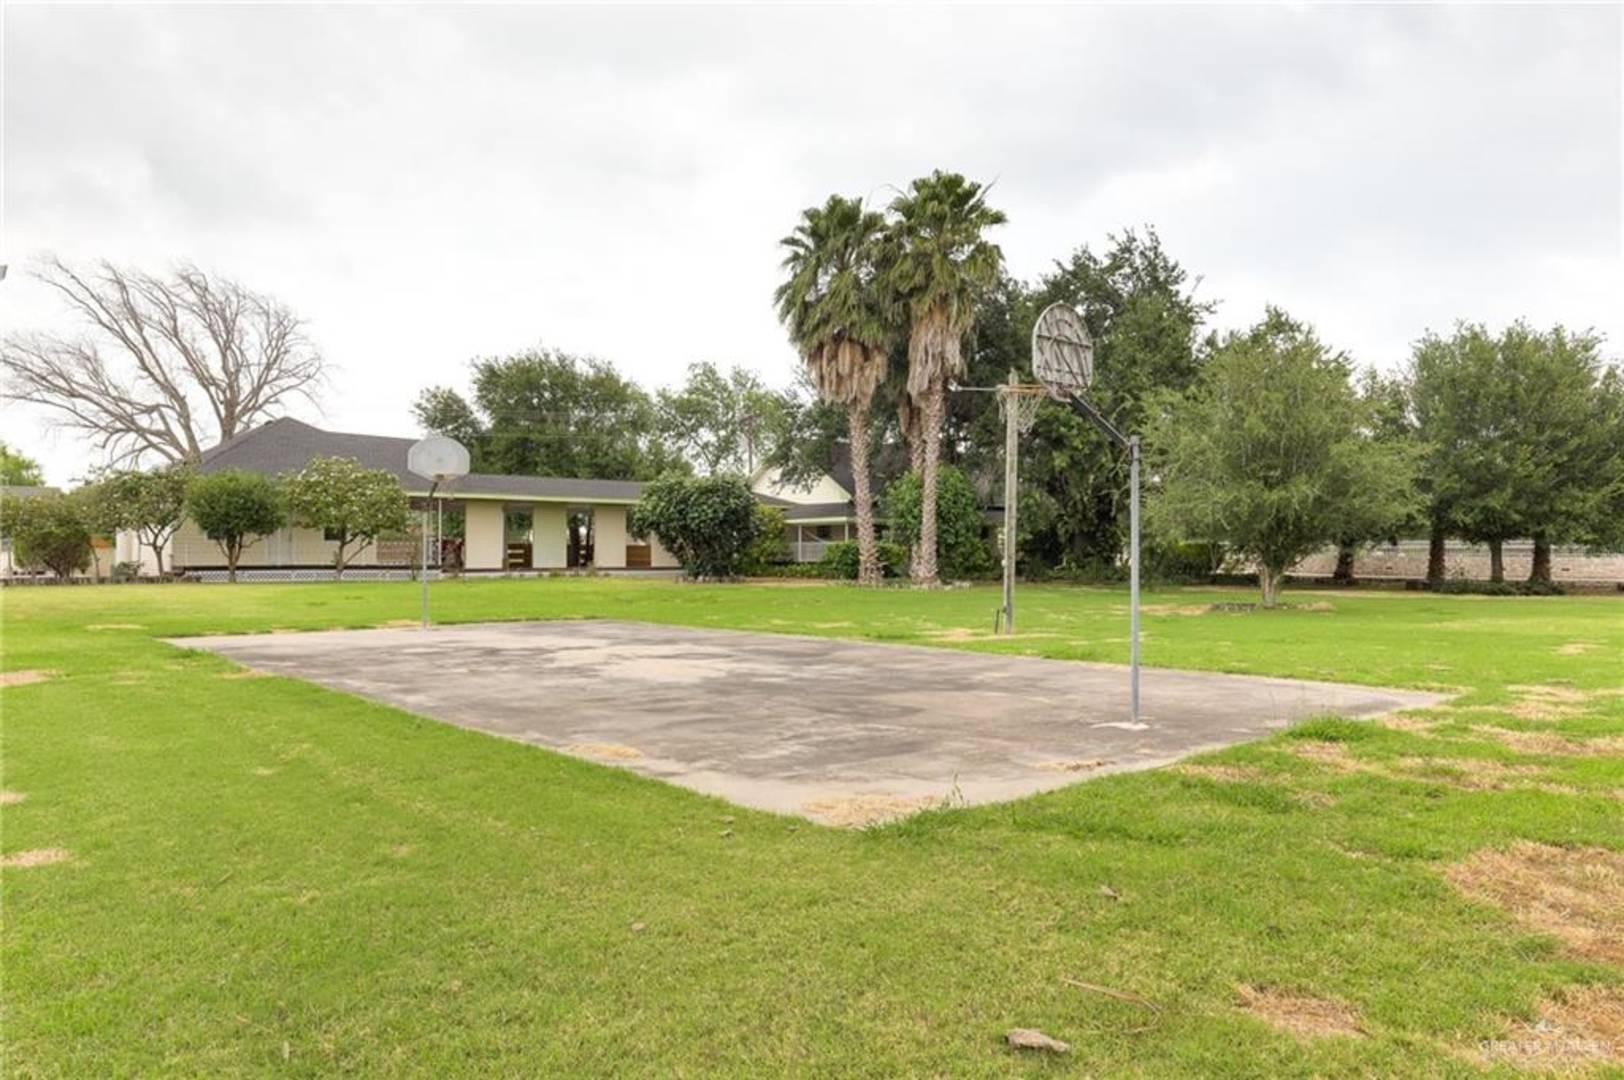 415 S Glasscock Boulevard, Alton, TX 78573 Mission, TX 78573